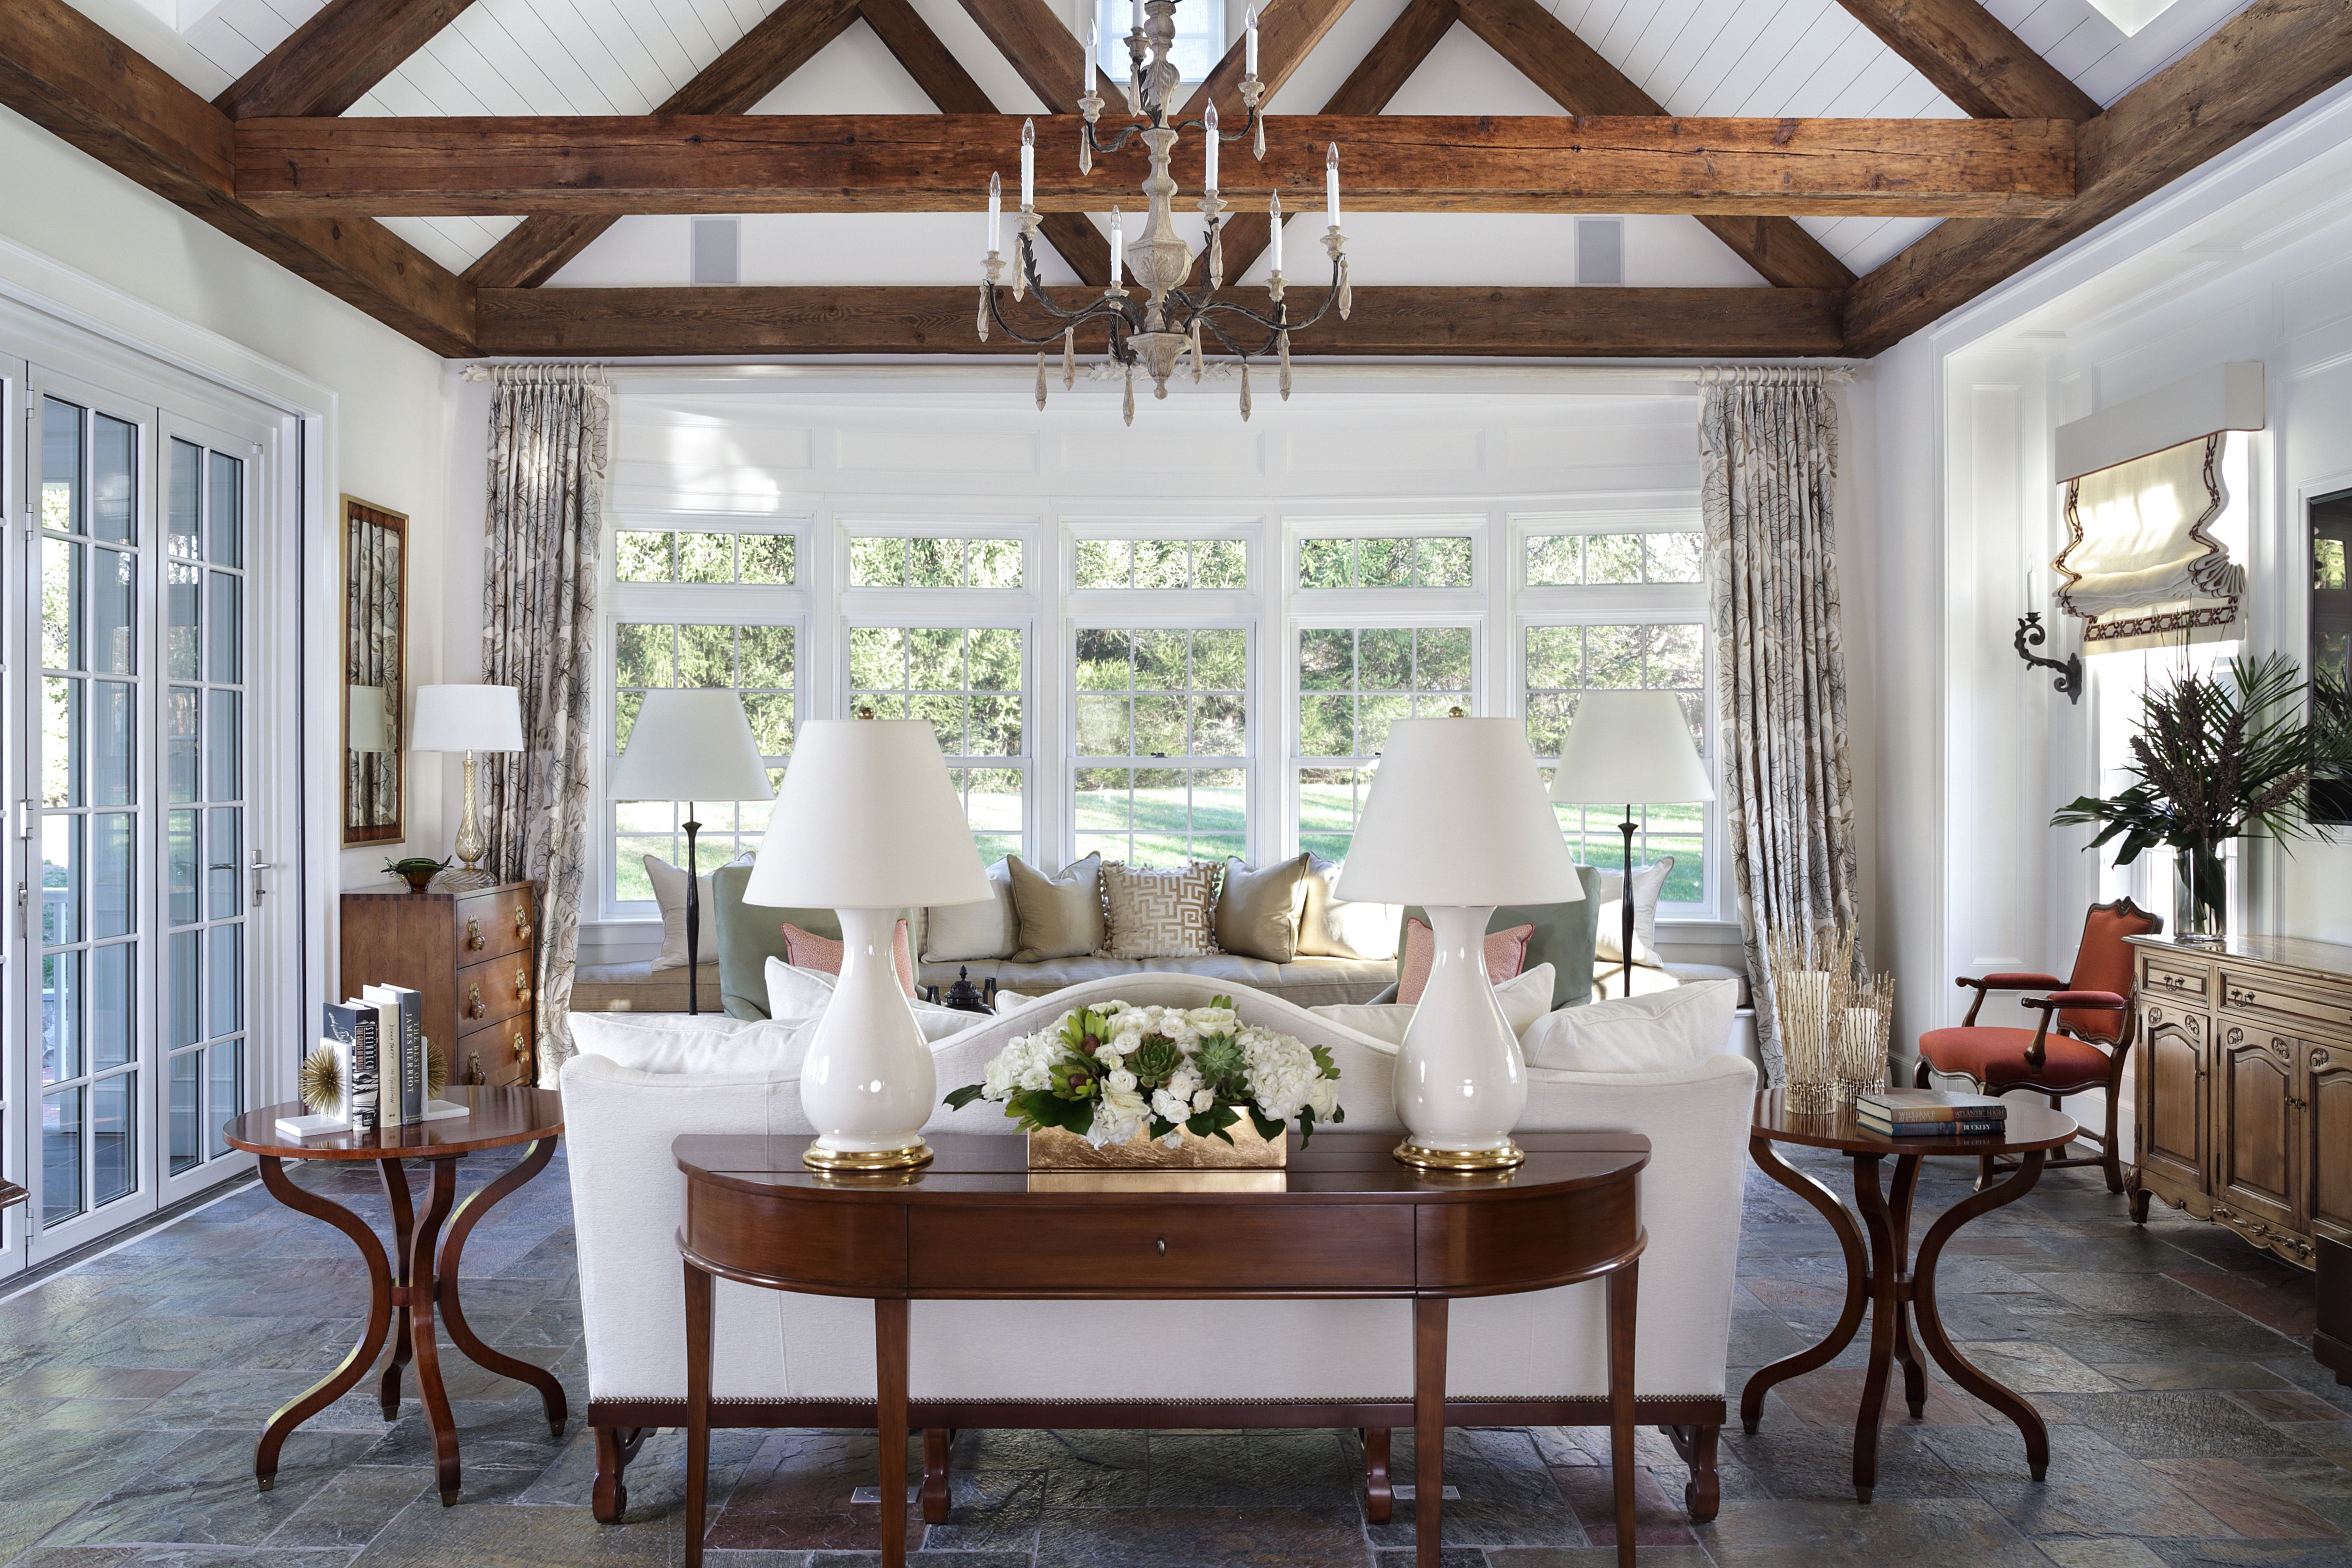 Window ideas for a sunroom  sunroom claved slate floor reclaimend beamswindow seatnano door